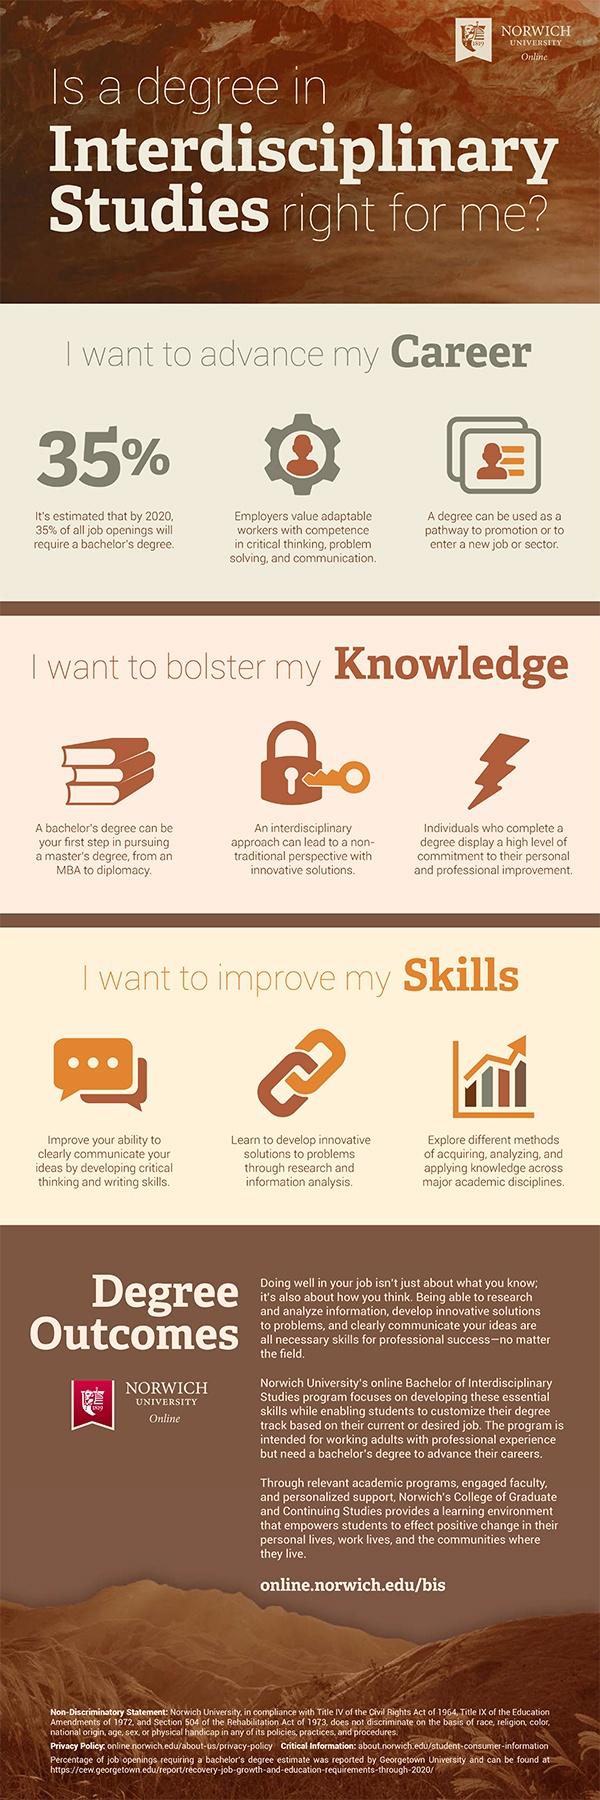 BIS_get_degree_infographic.jpg